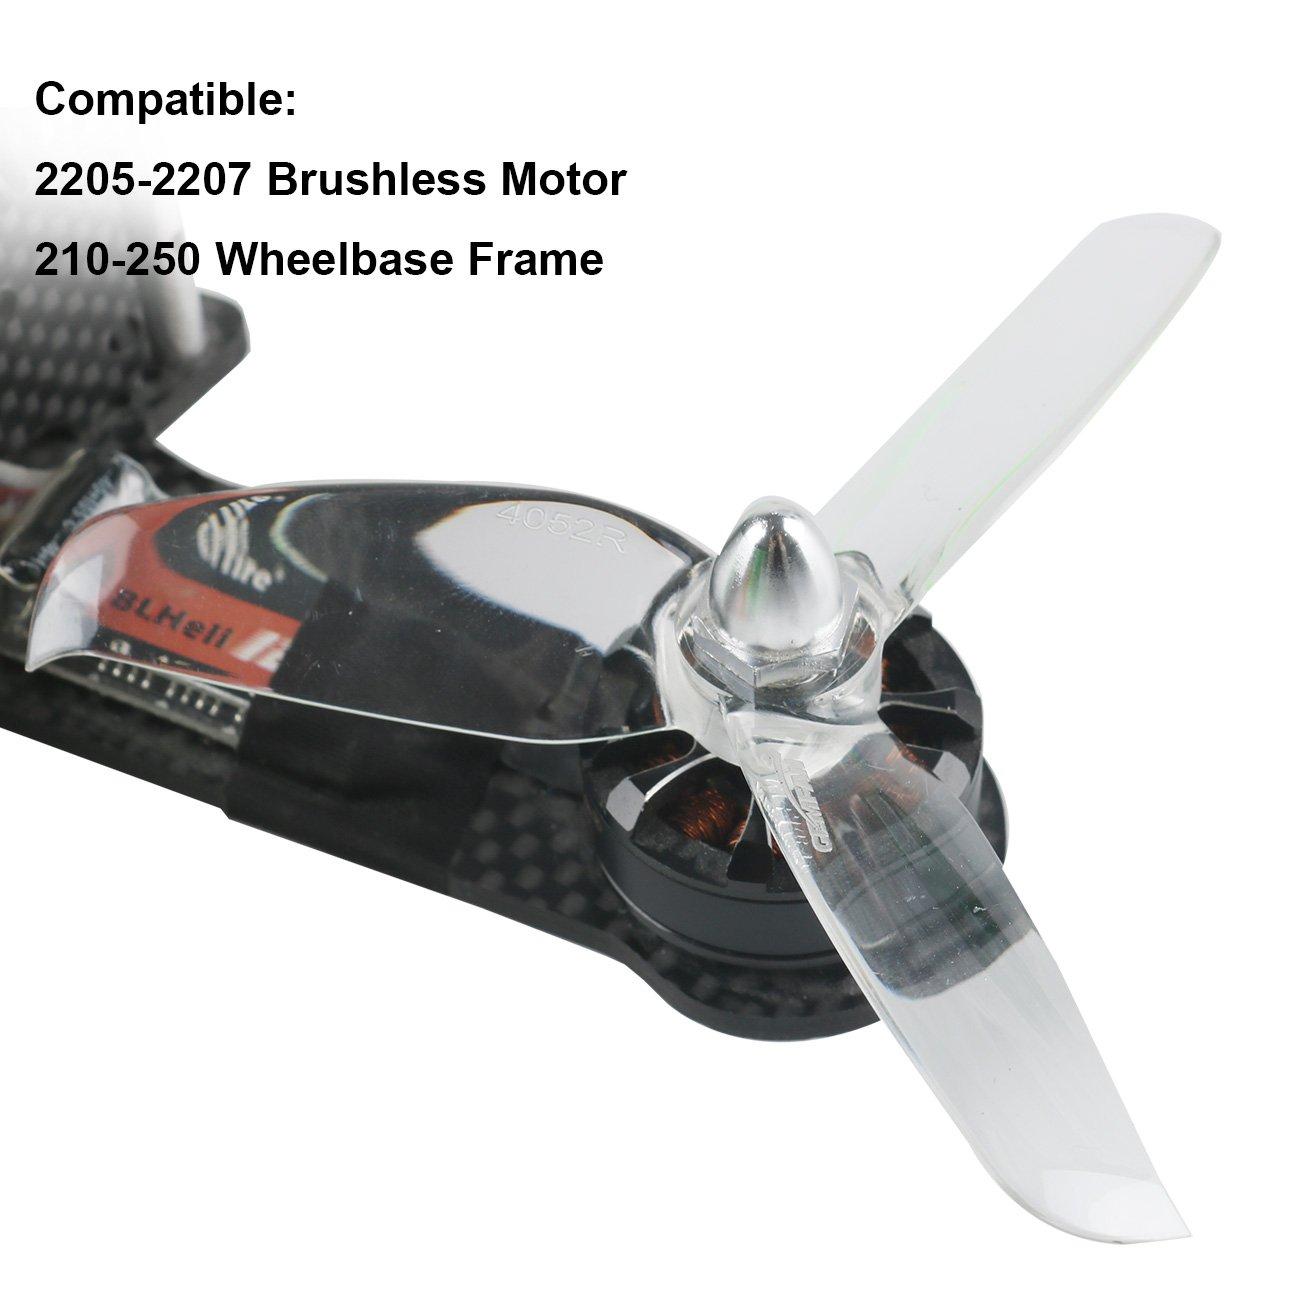 Orange HD 4052(40X5.2) Tri Blade Flash Propellers 2CW+2CCW 2 Pair-Transparent